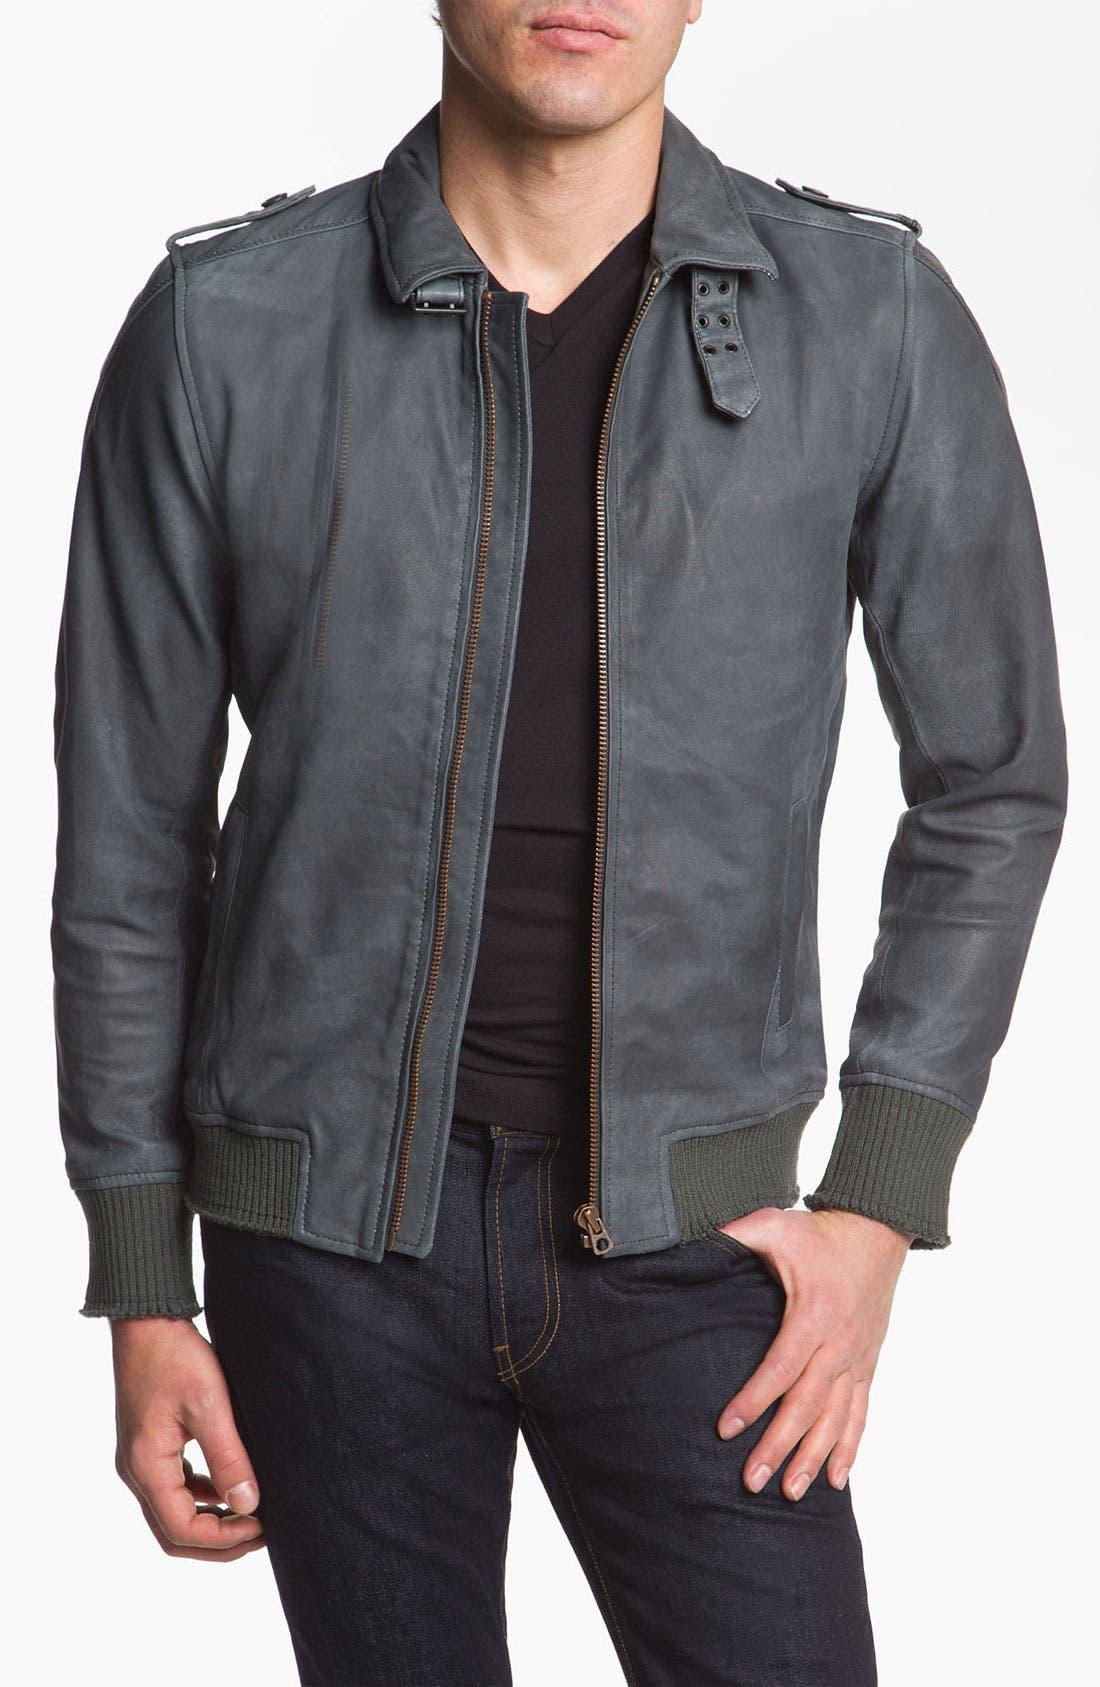 Alternate Image 1 Selected - DIESEL® 'Lacco' Leather Jacket